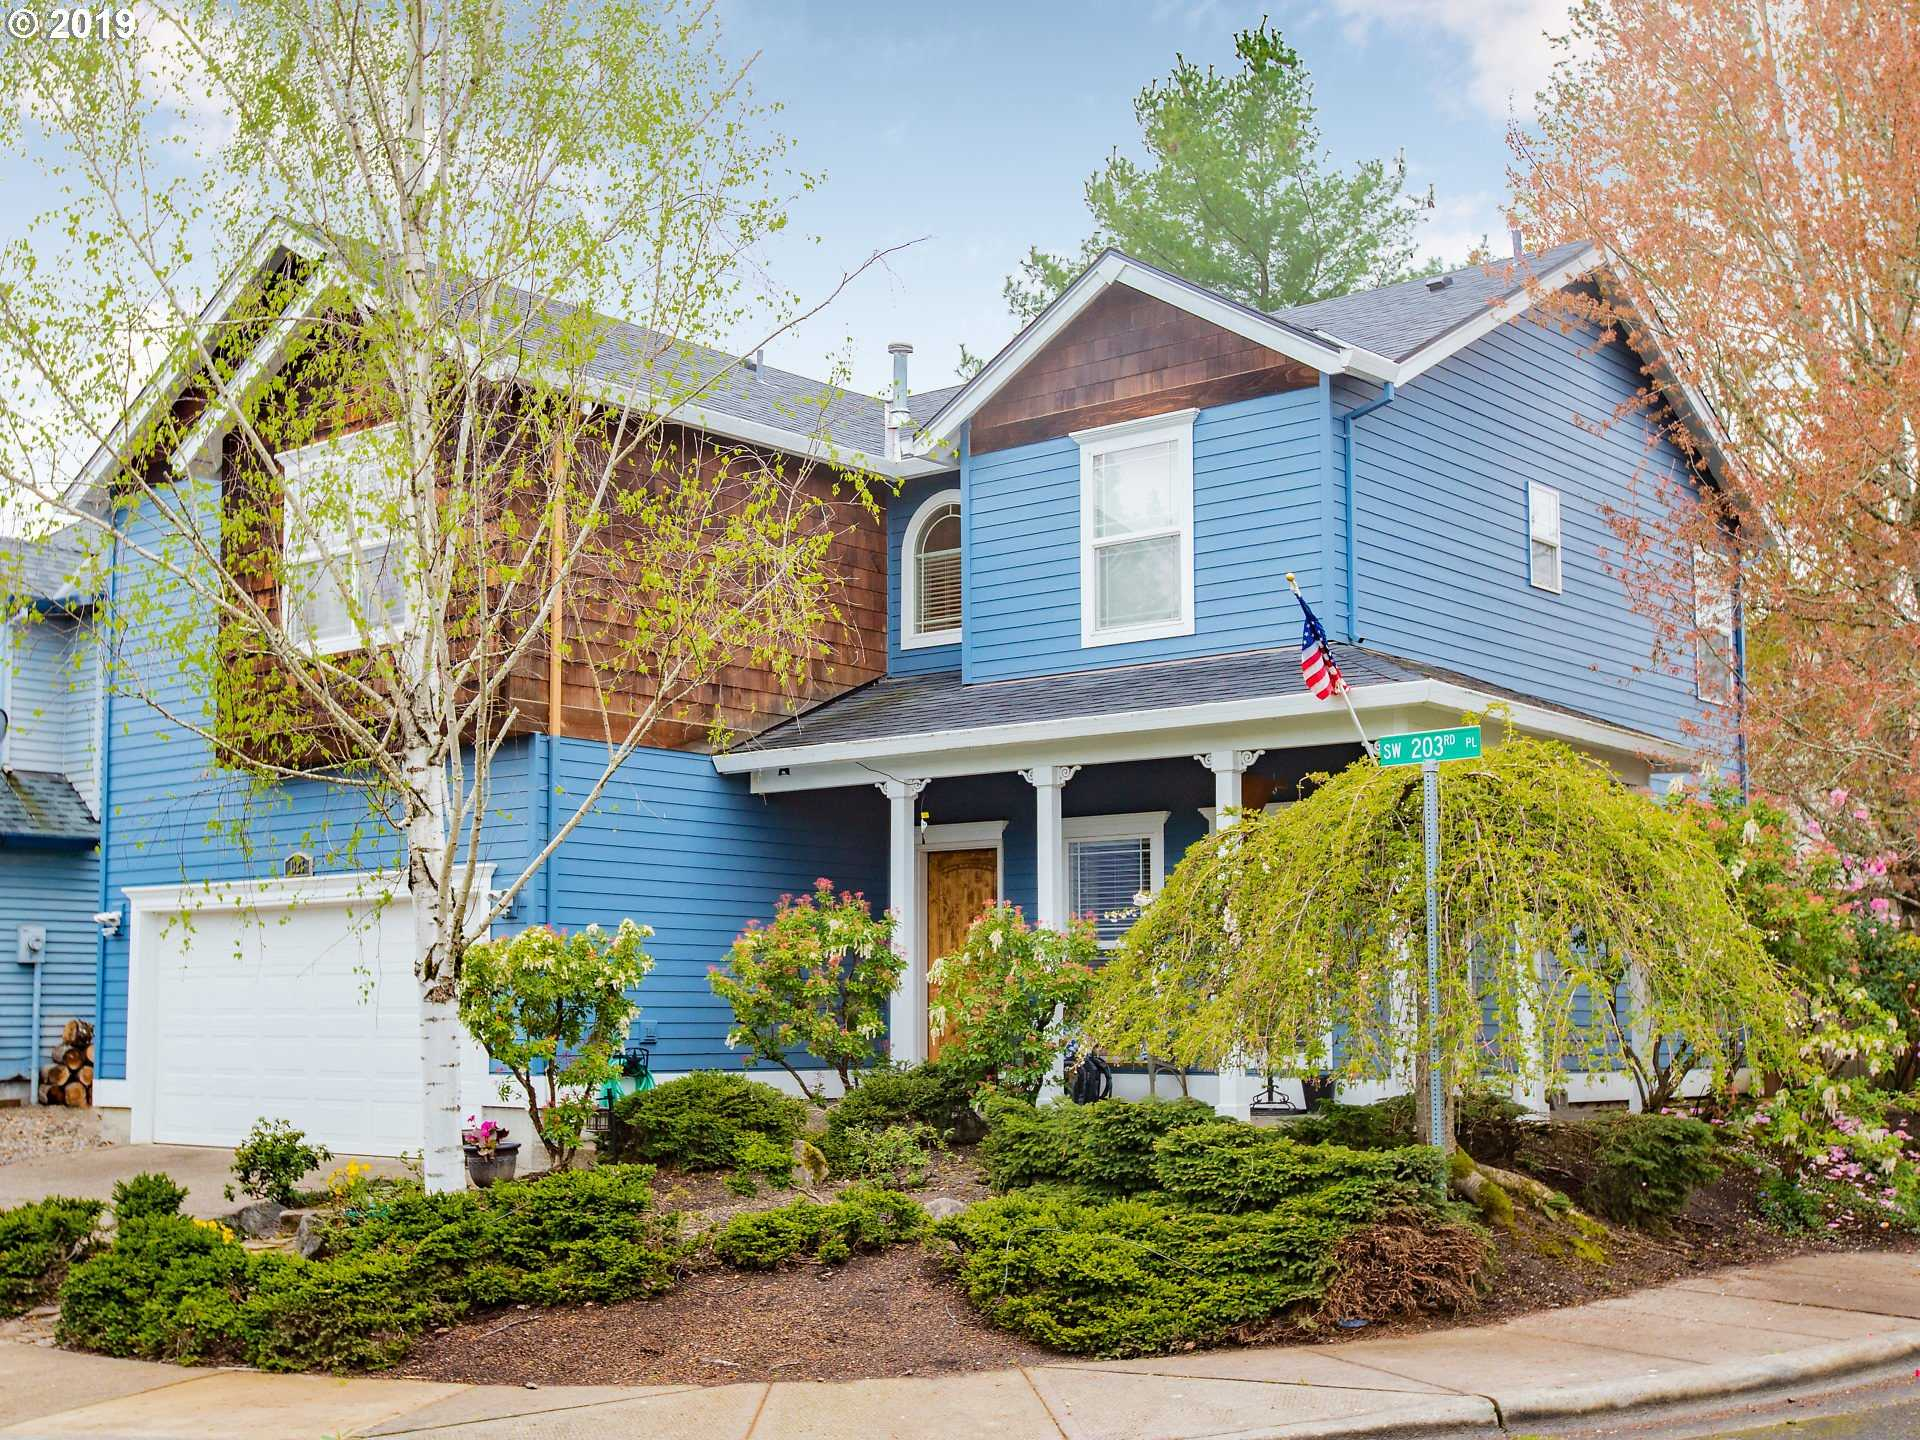 $399,000 - 3Br/3Ba -  for Sale in Beaverton